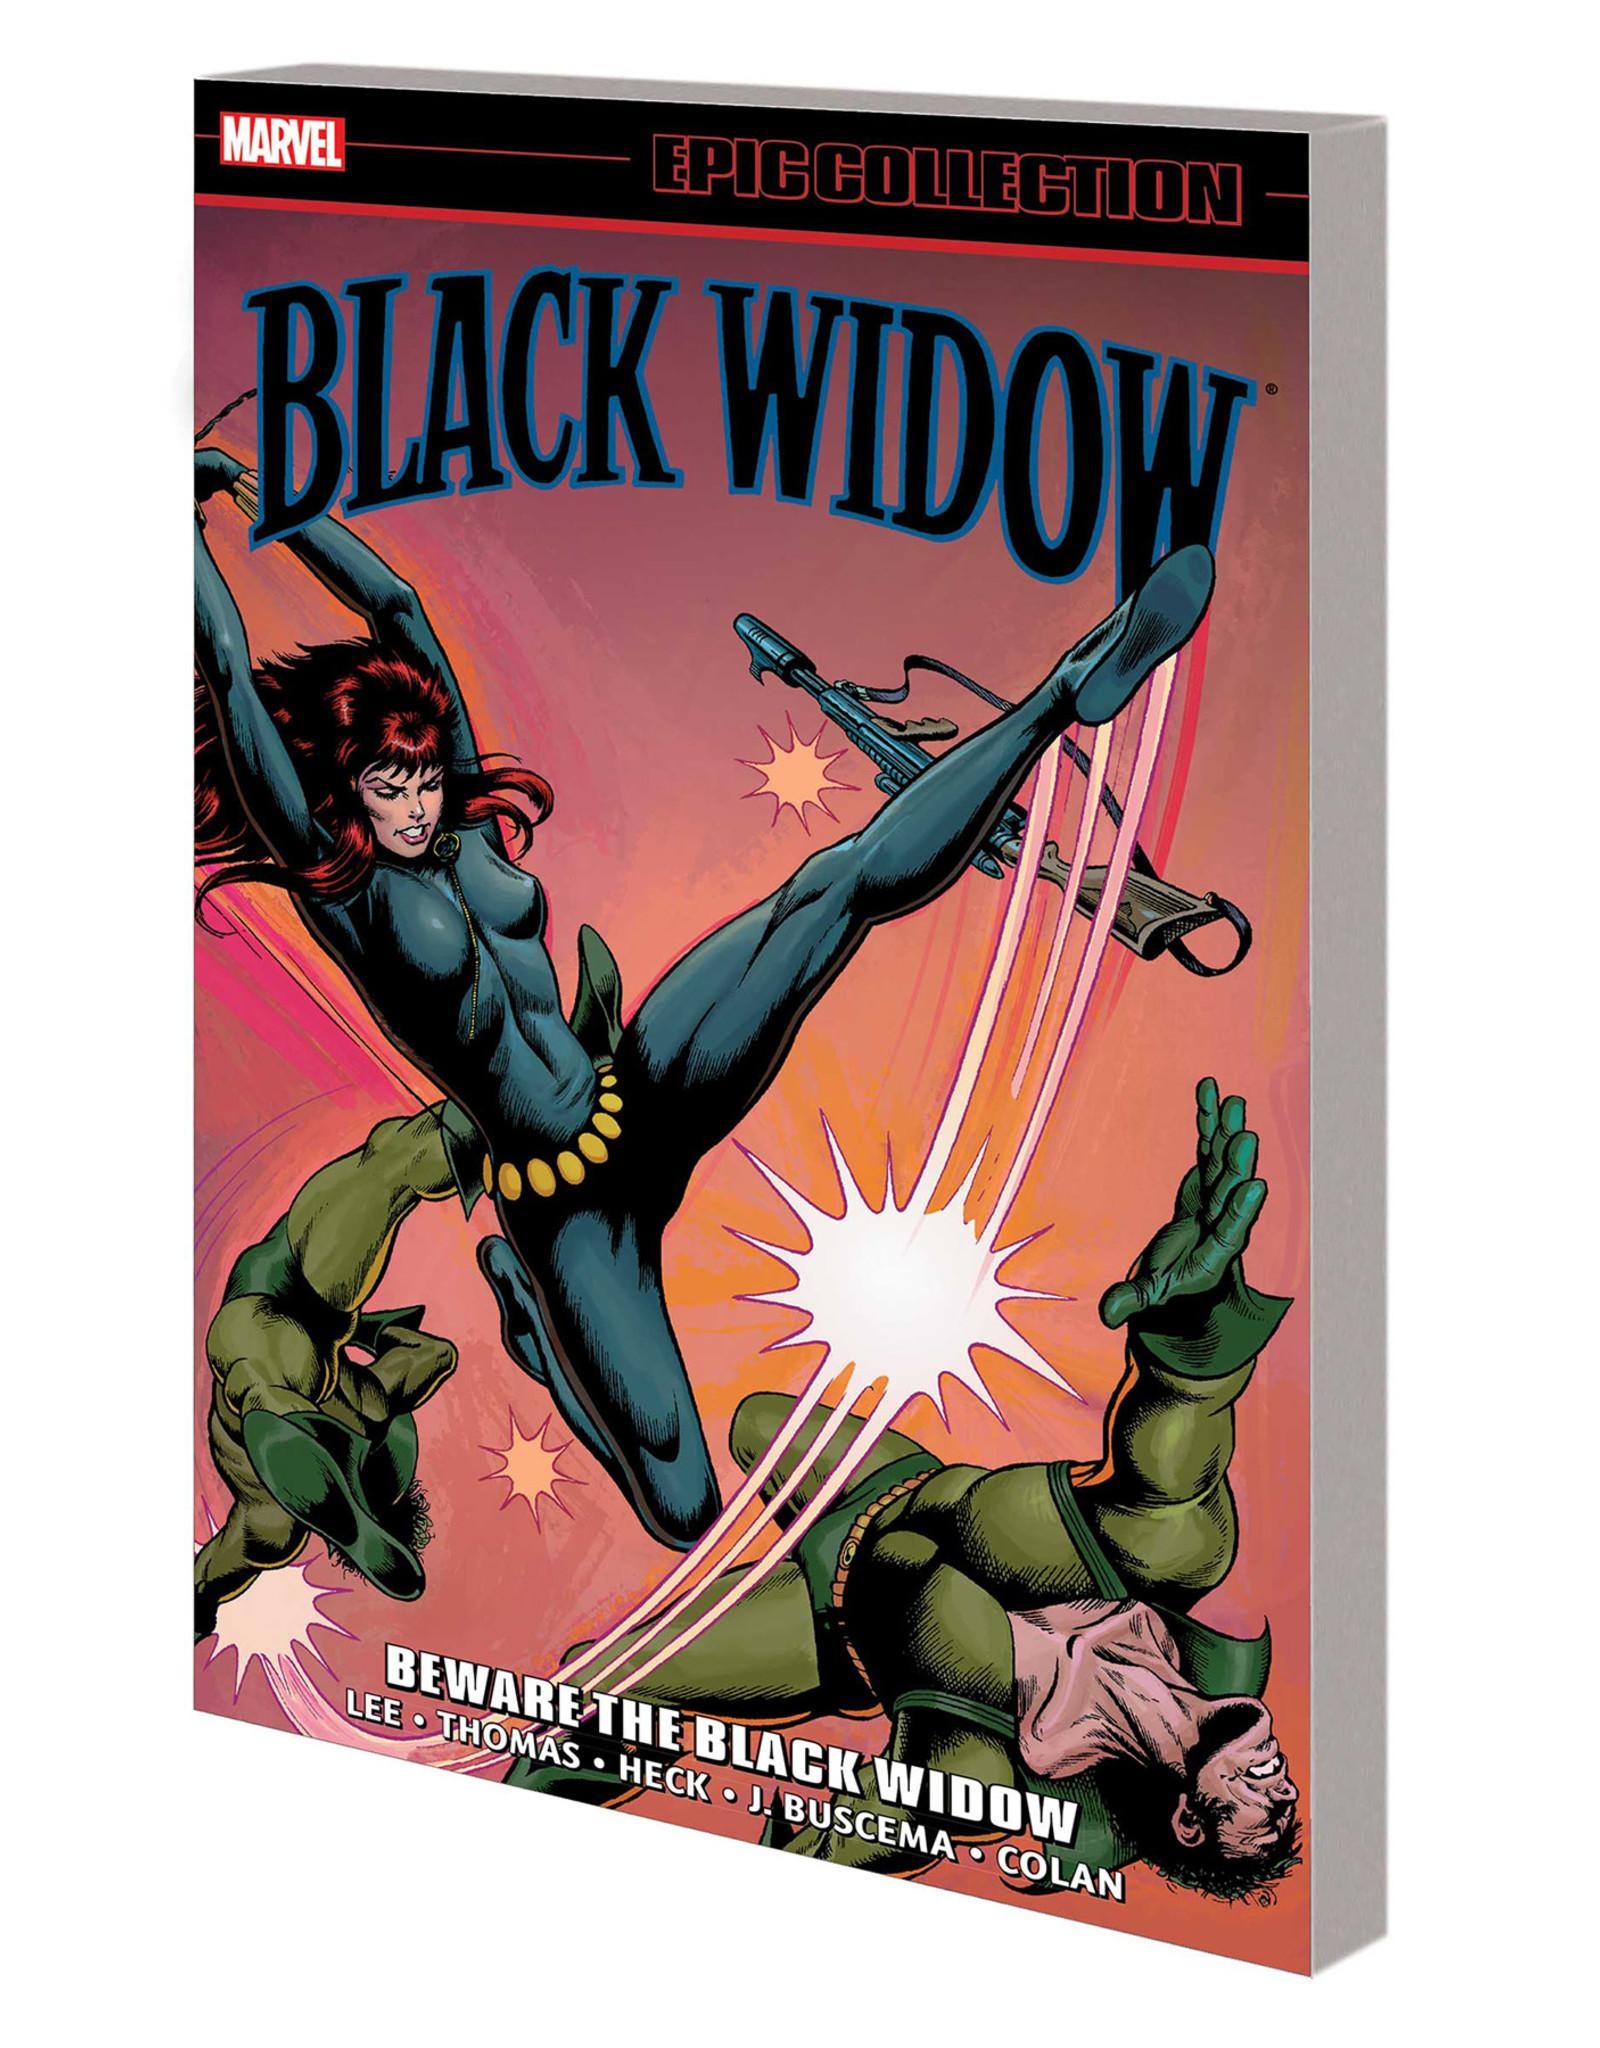 MARVEL COMICS BLACK WIDOW EPIC COLLECTION TP BEWARE BLACK WIDOW